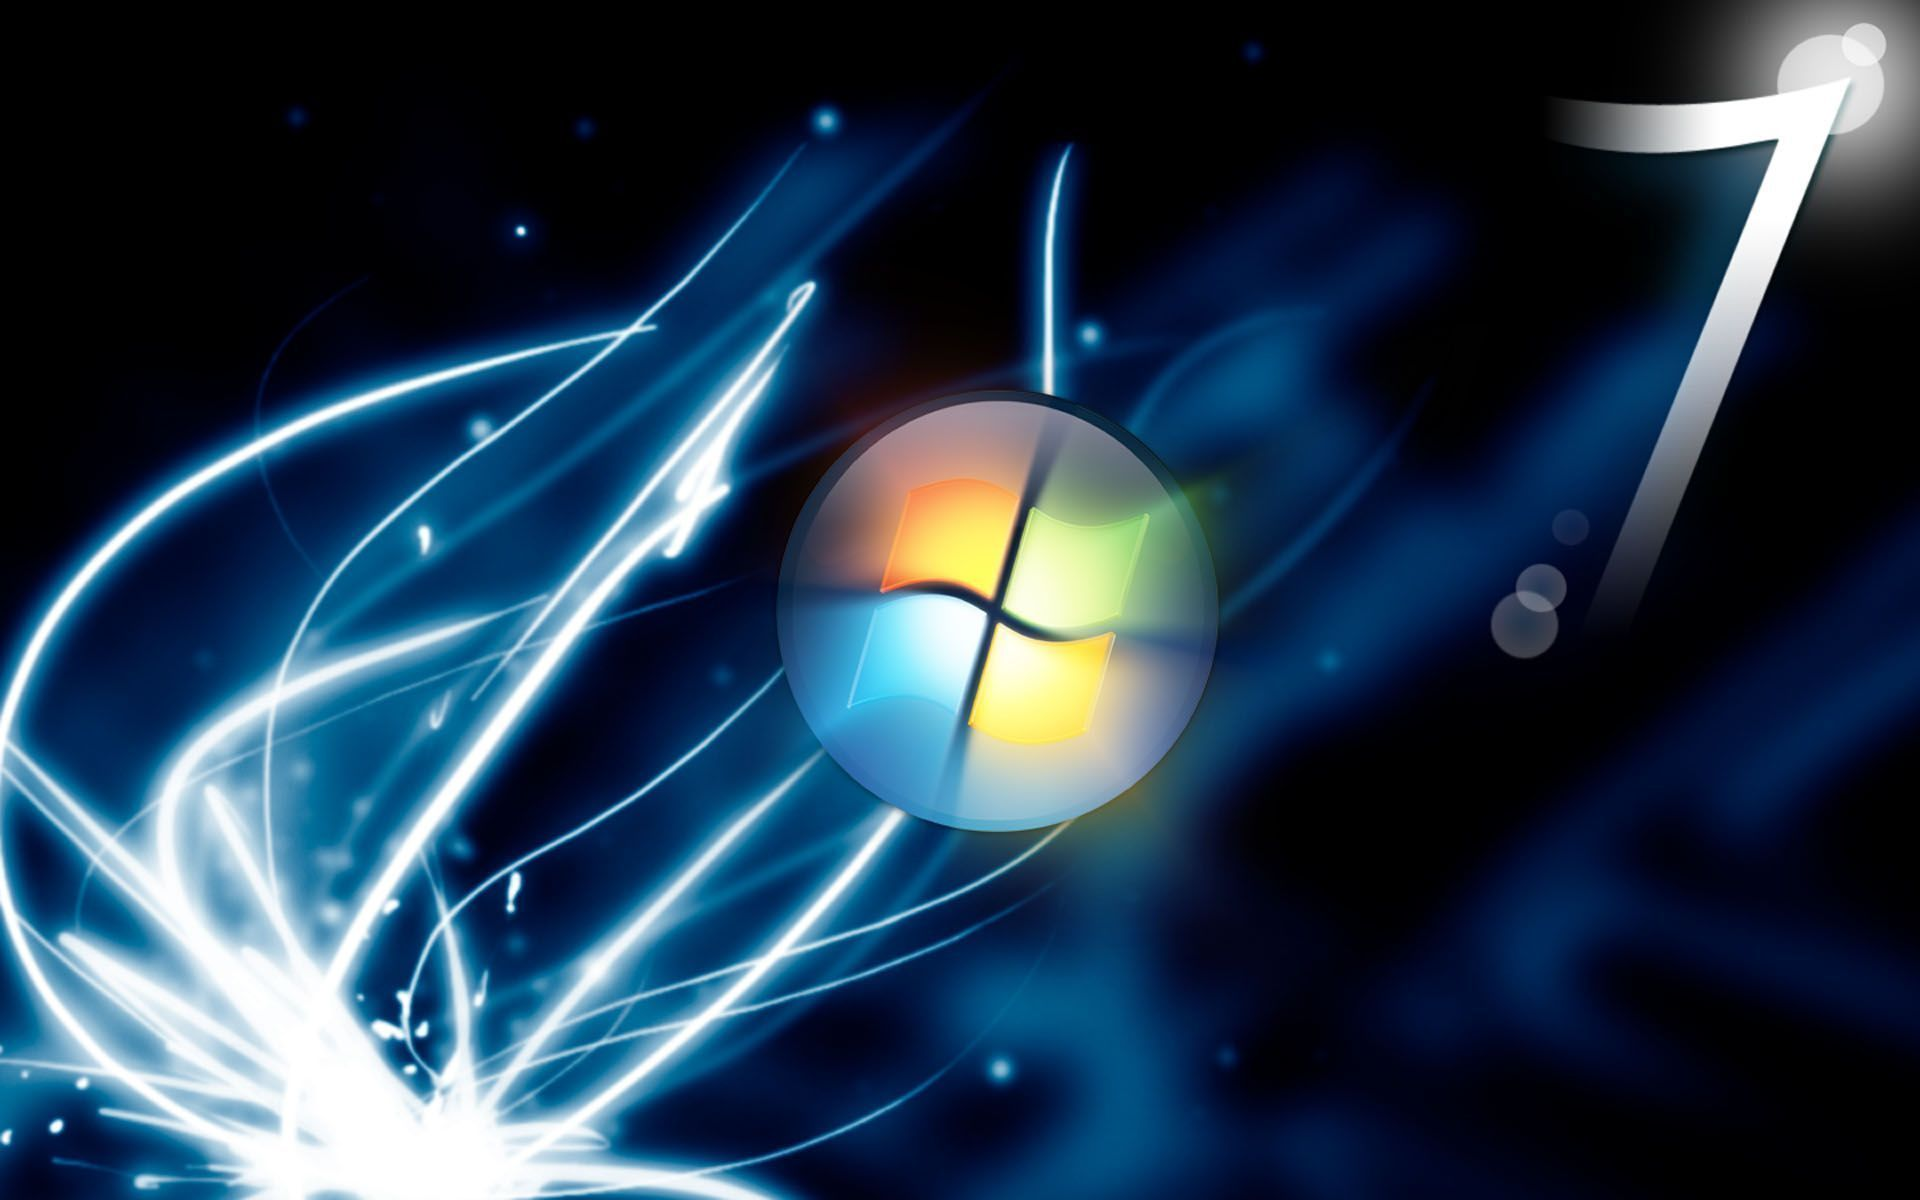 Windows 7 Ultimate Wallpaper Hd Laptop Nature Widescreen 1920x1200